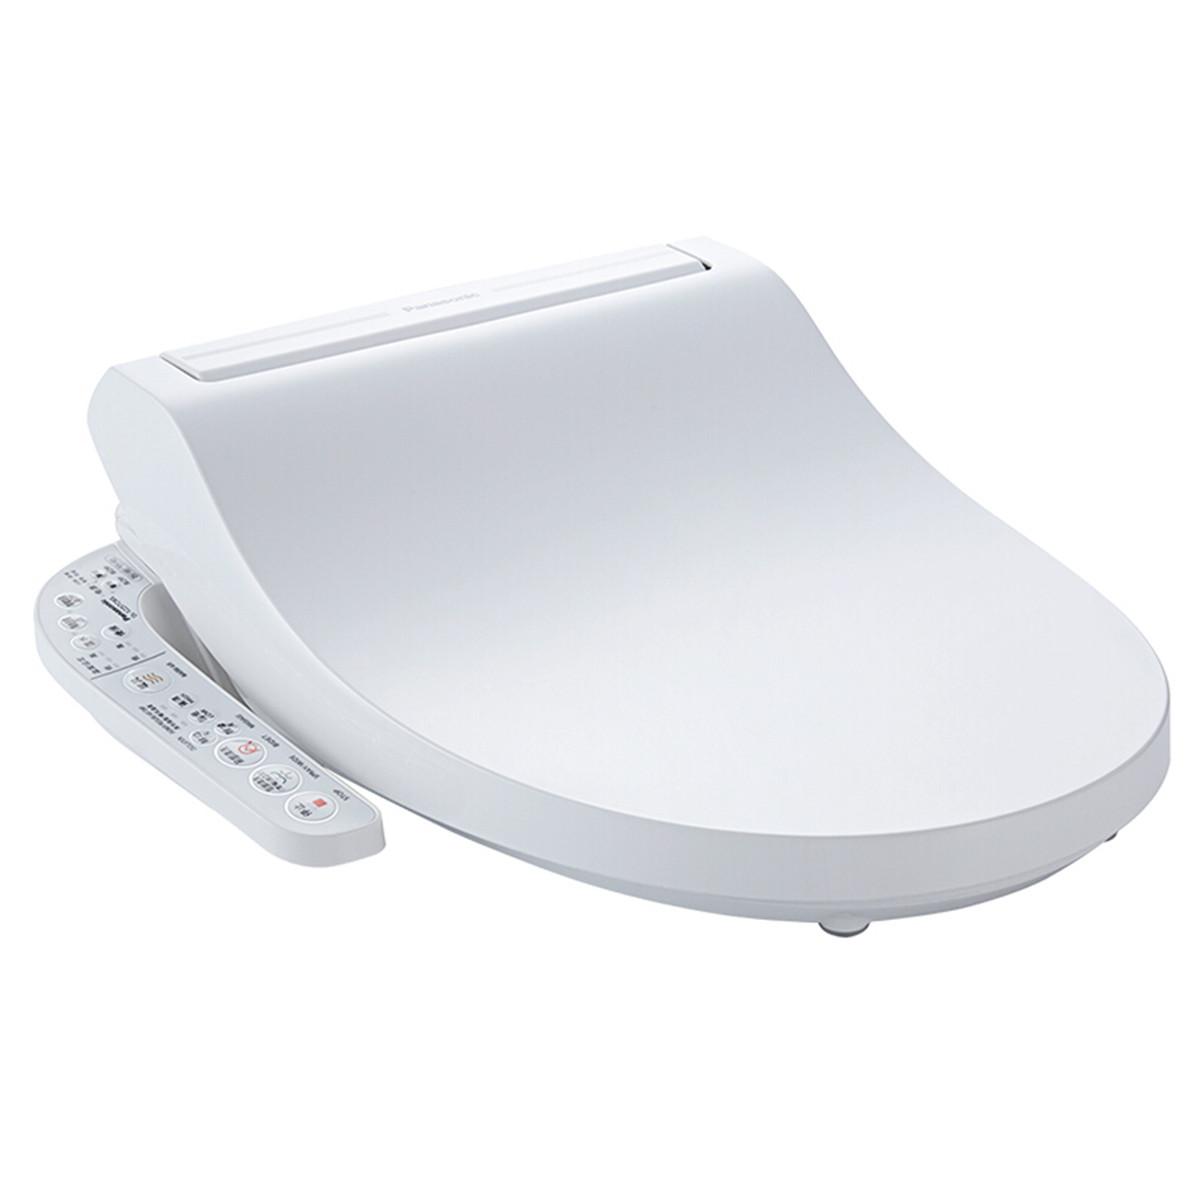 Panasonic 松下 即热式暖风款智能马桶盖DL-5225CWS